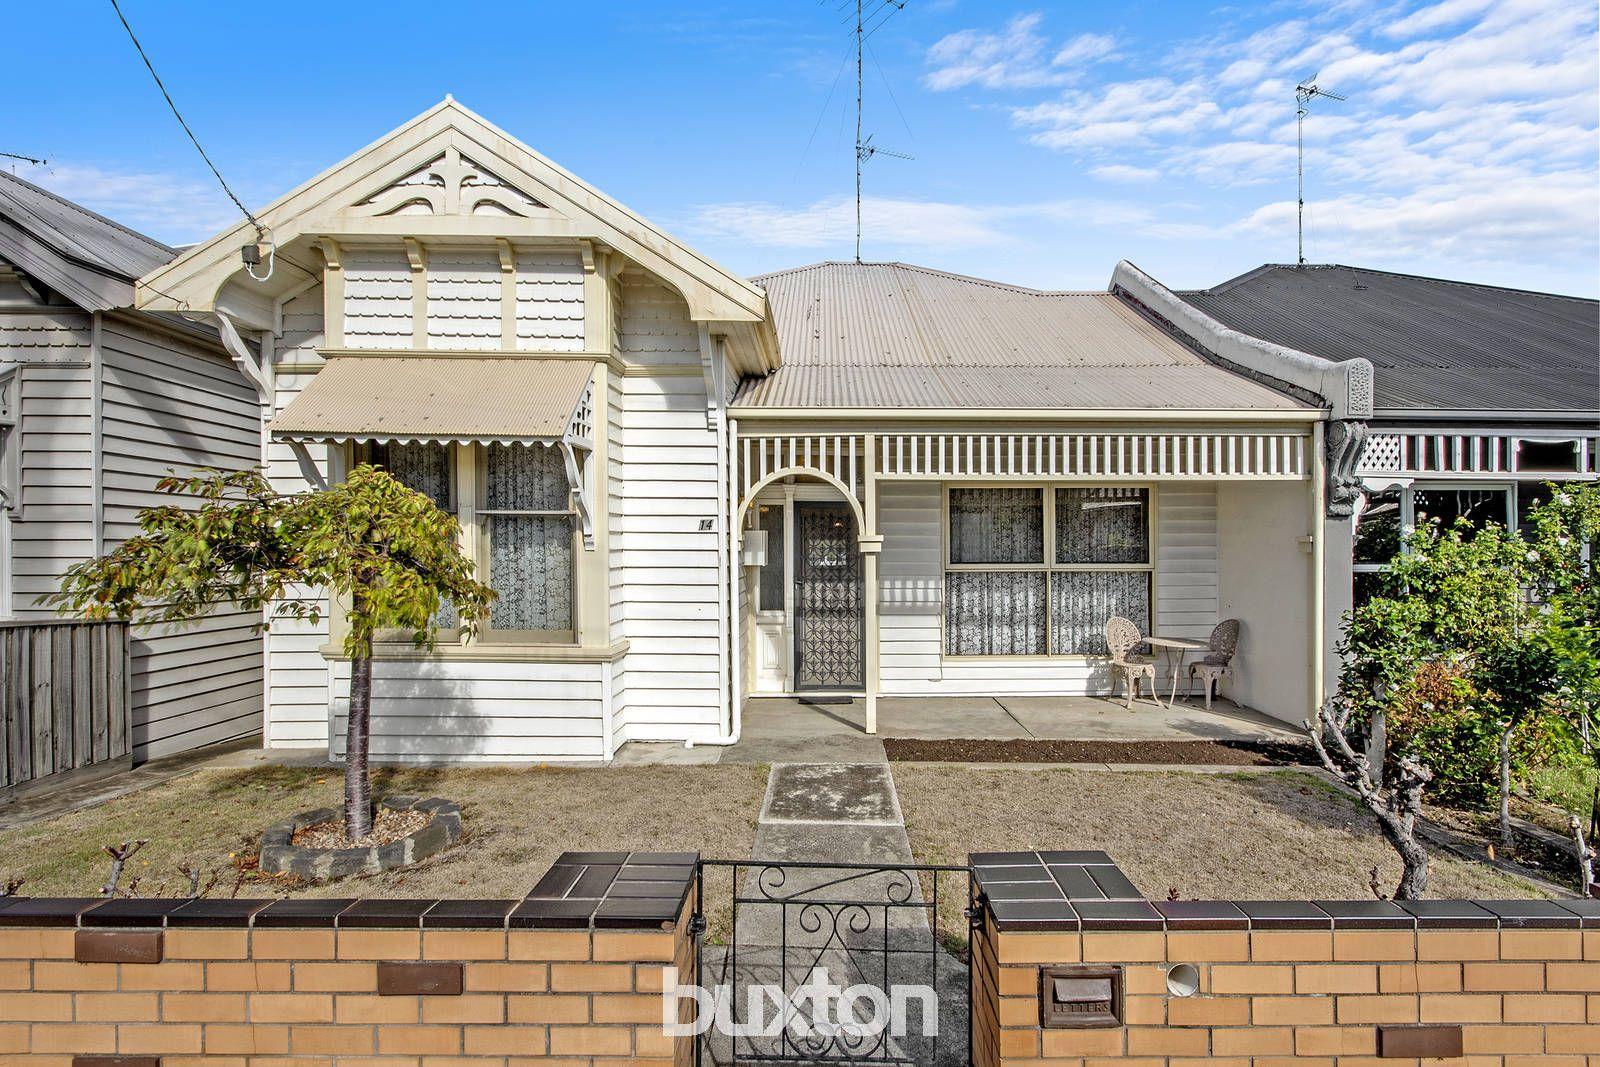 14 McKillop Street, Geelong VIC 3220, Image 0